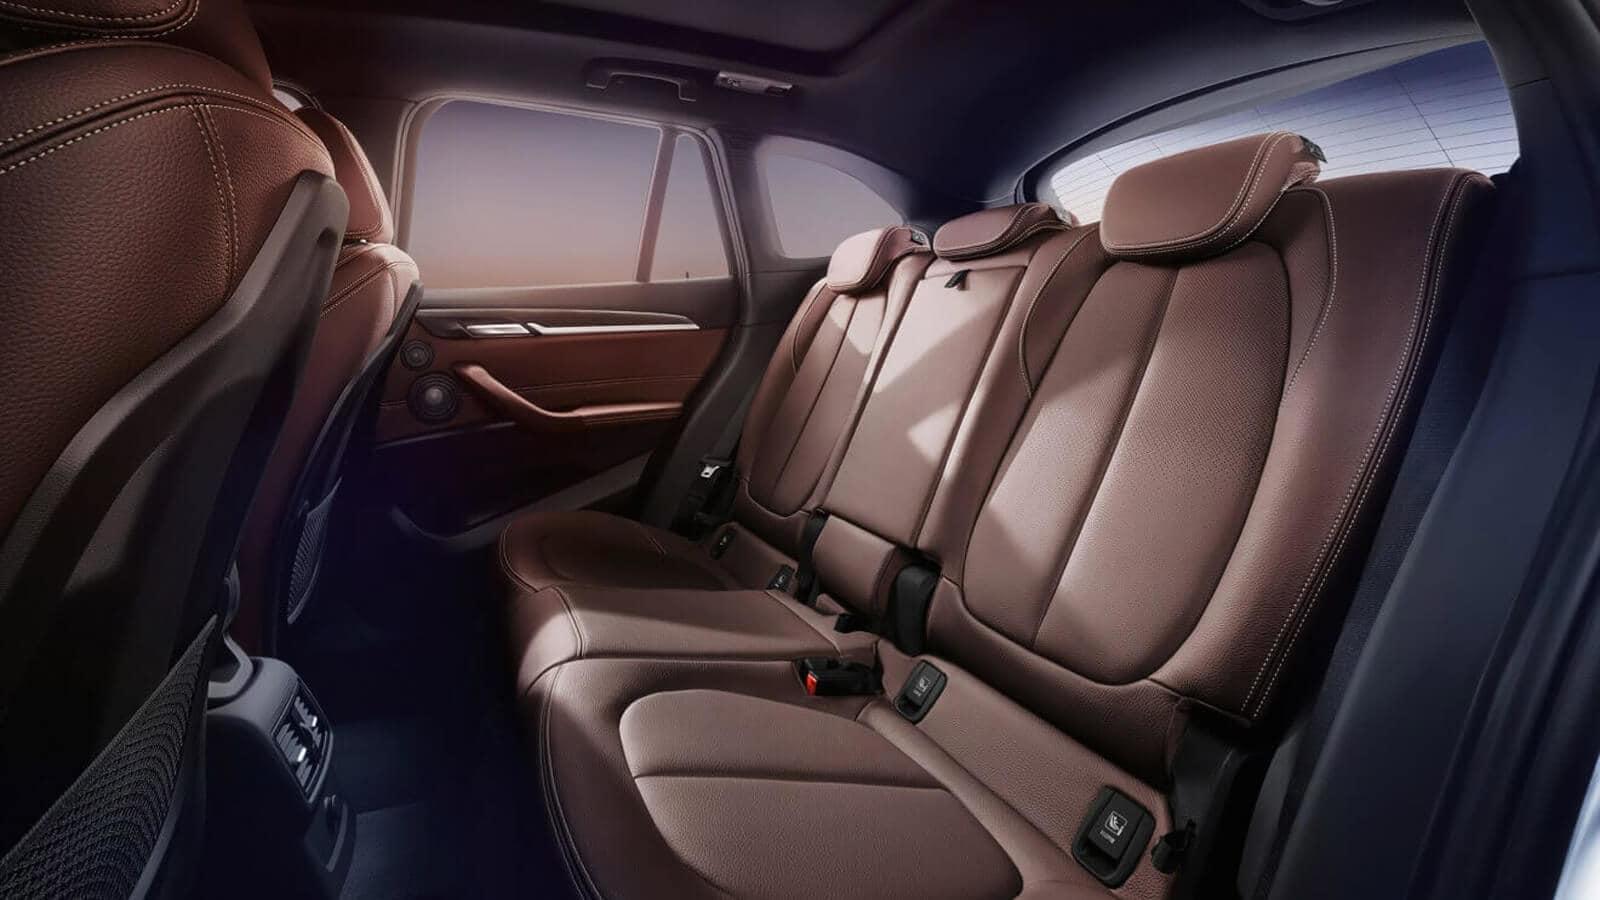 2019 X1 Rear Seating